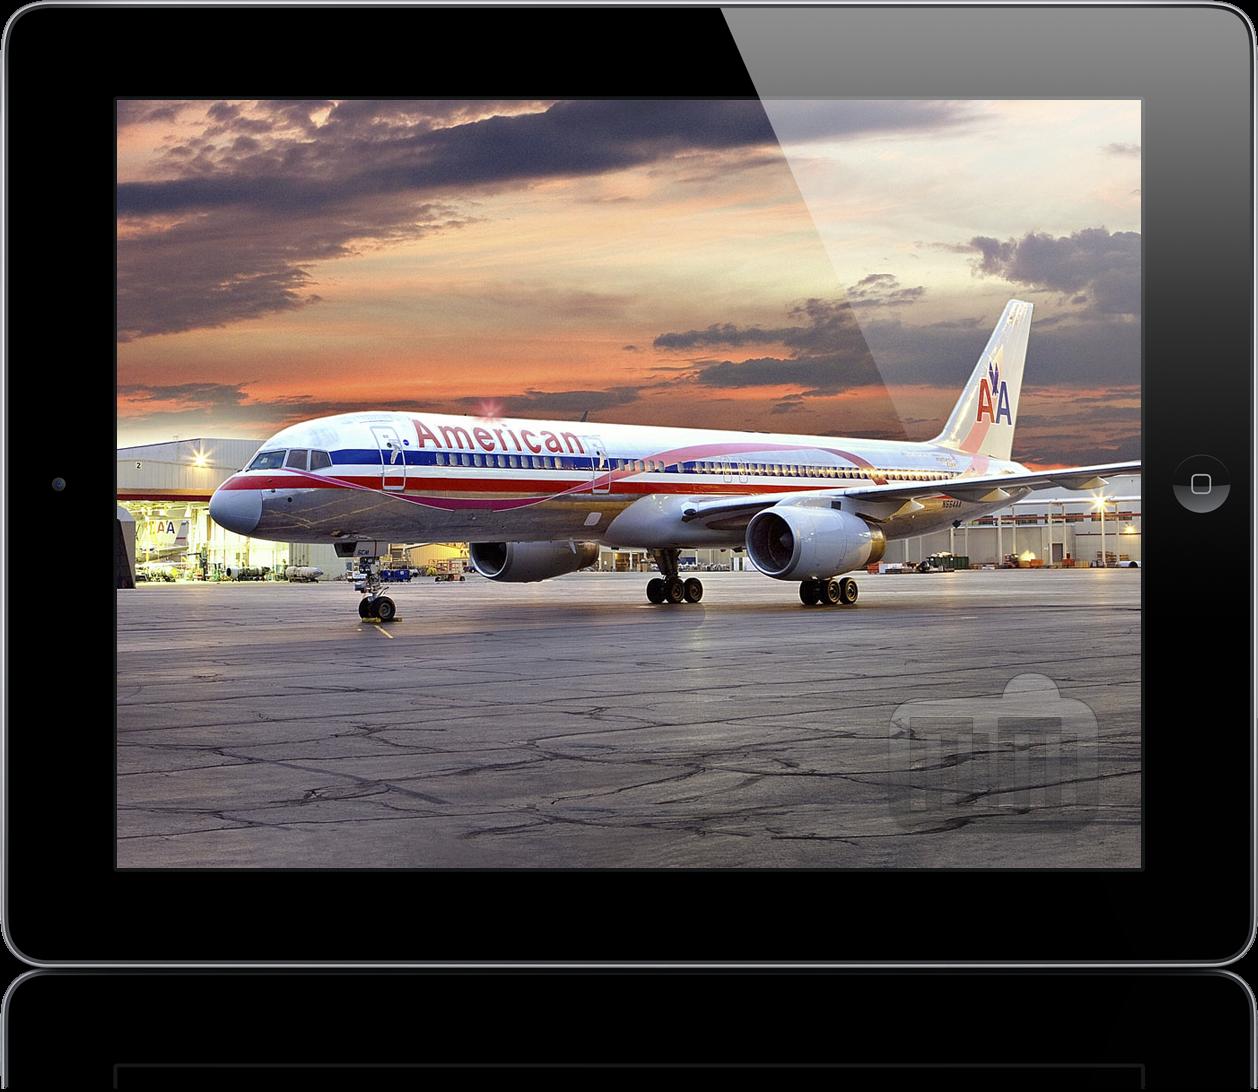 Avião da American Airlines em iPad